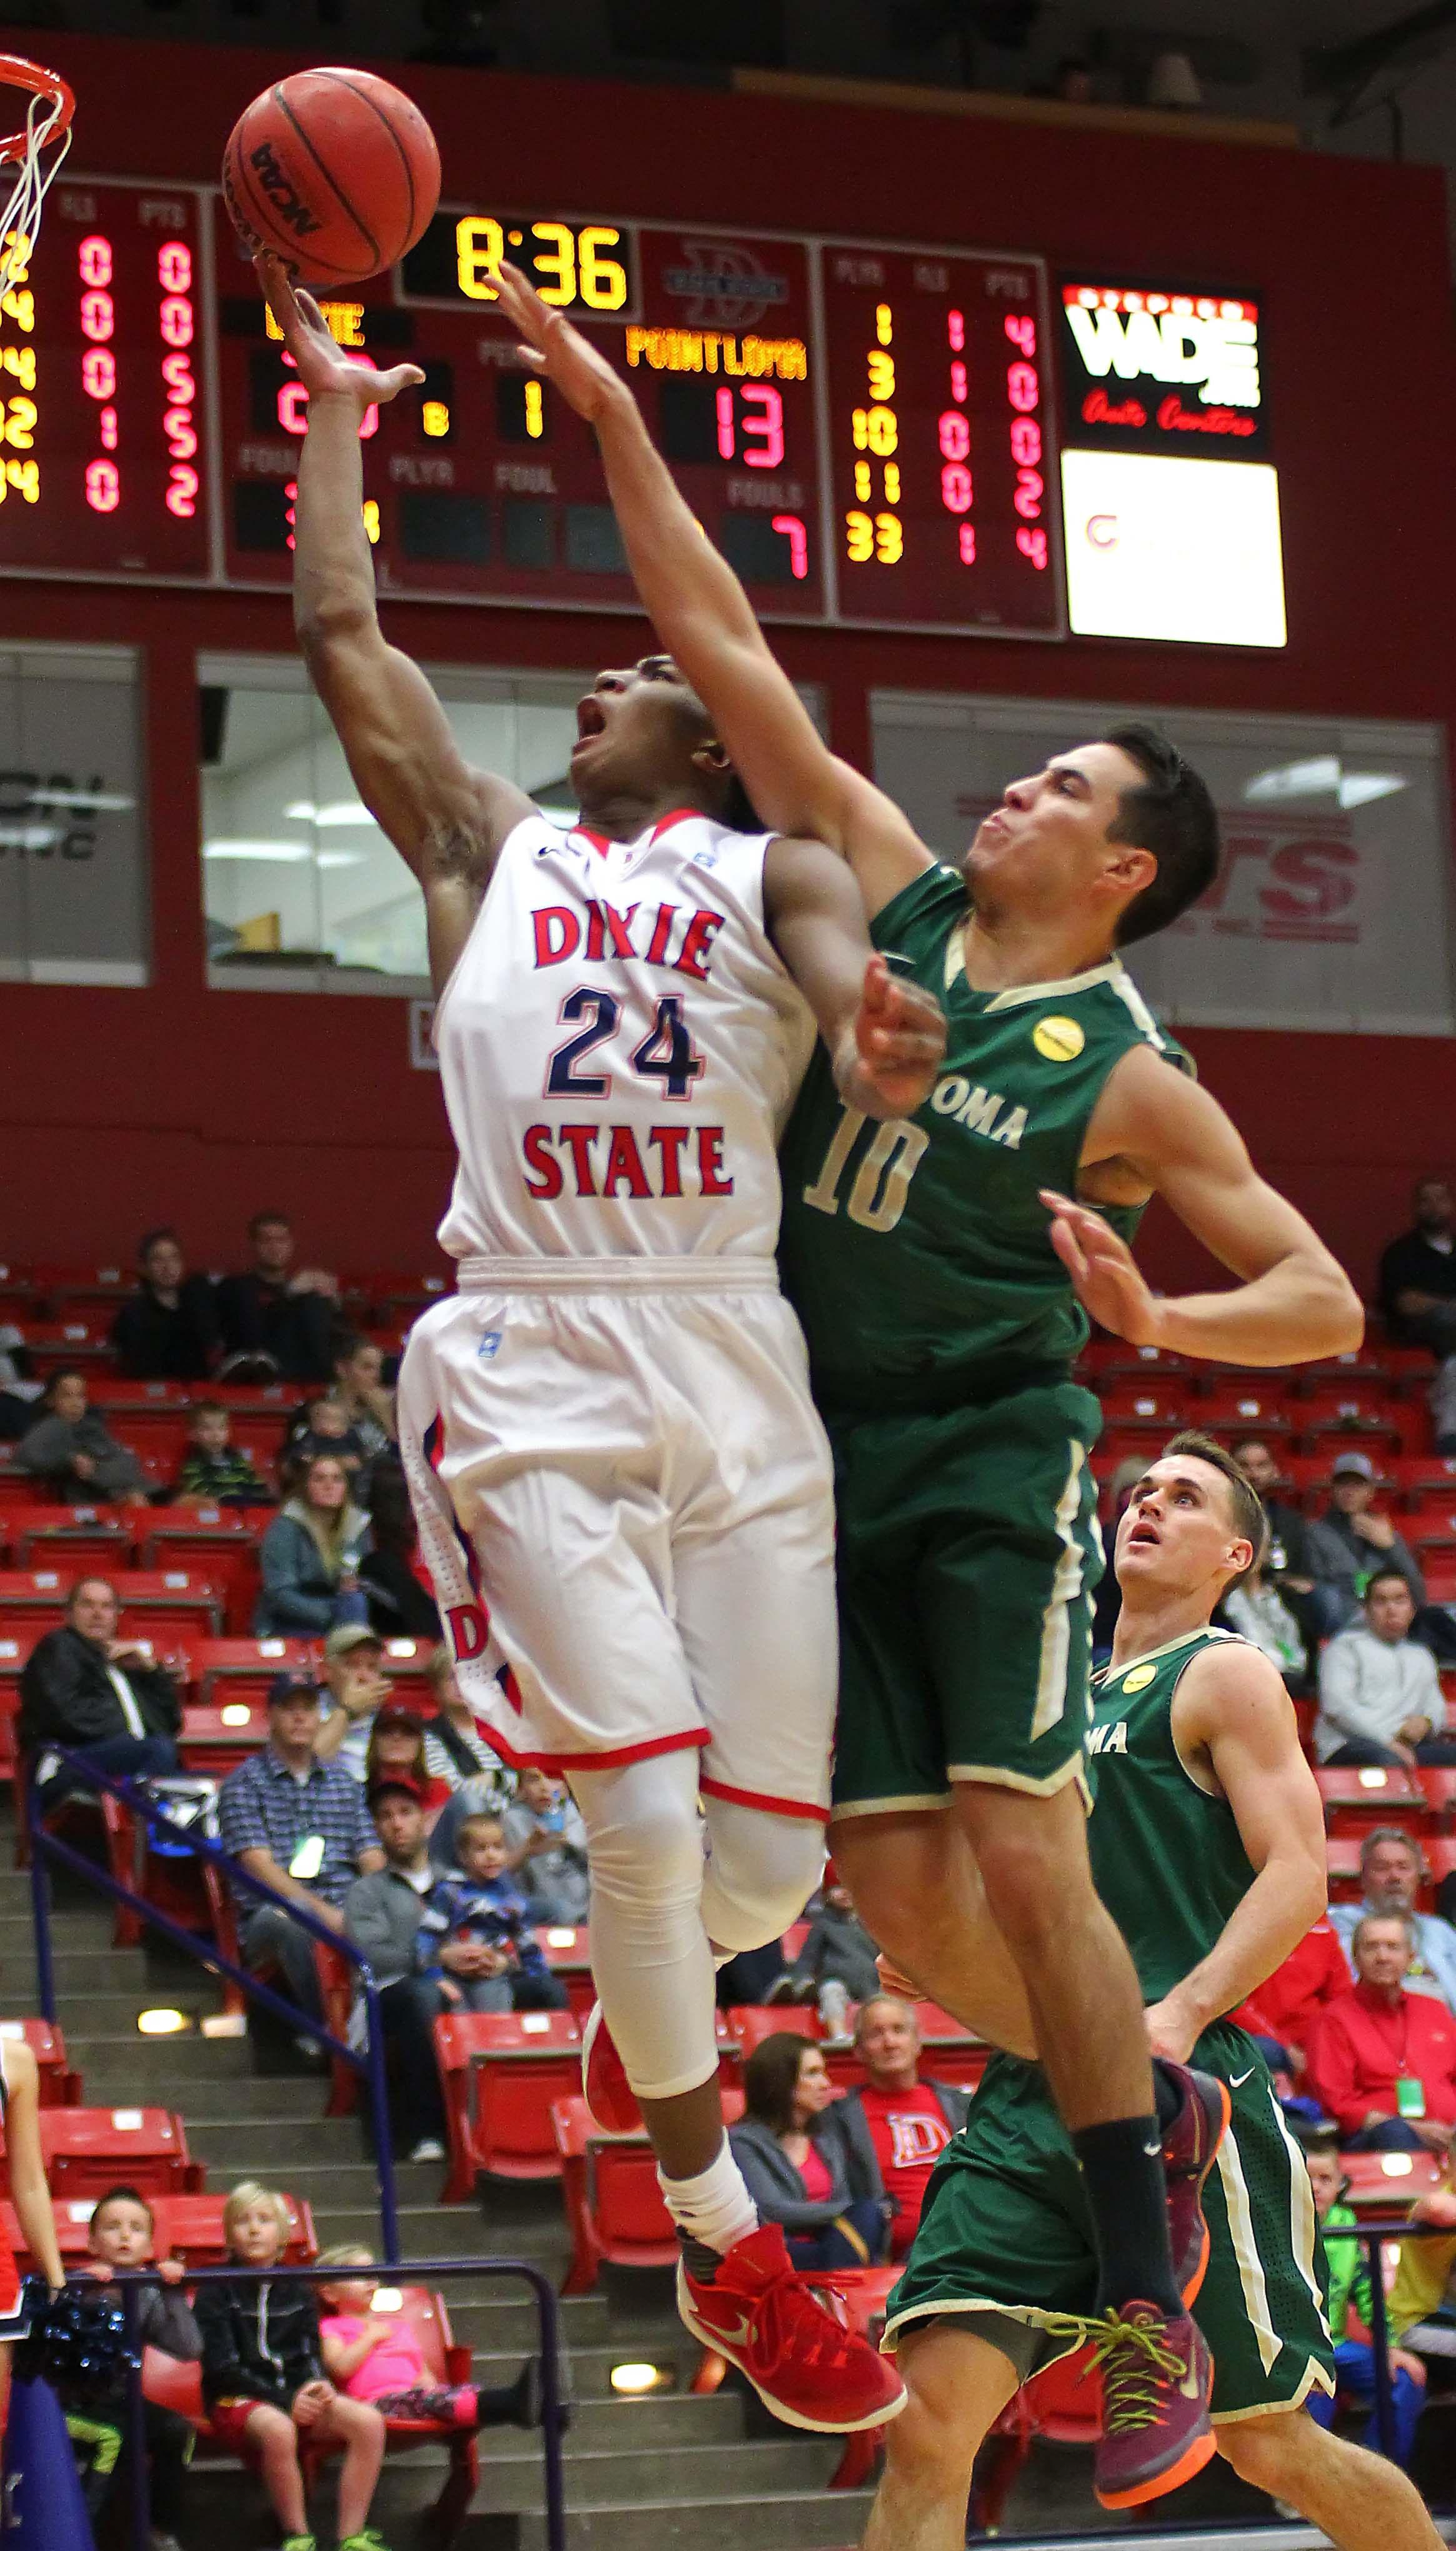 Dixie State's  Trevor Hill (24), Dixie State University vs. Point Loma University, Mens Basketball, St. George, Utah, Jan. 18, 2016, | Photo by Robert Hoppie, ASPpix.com, St. George News